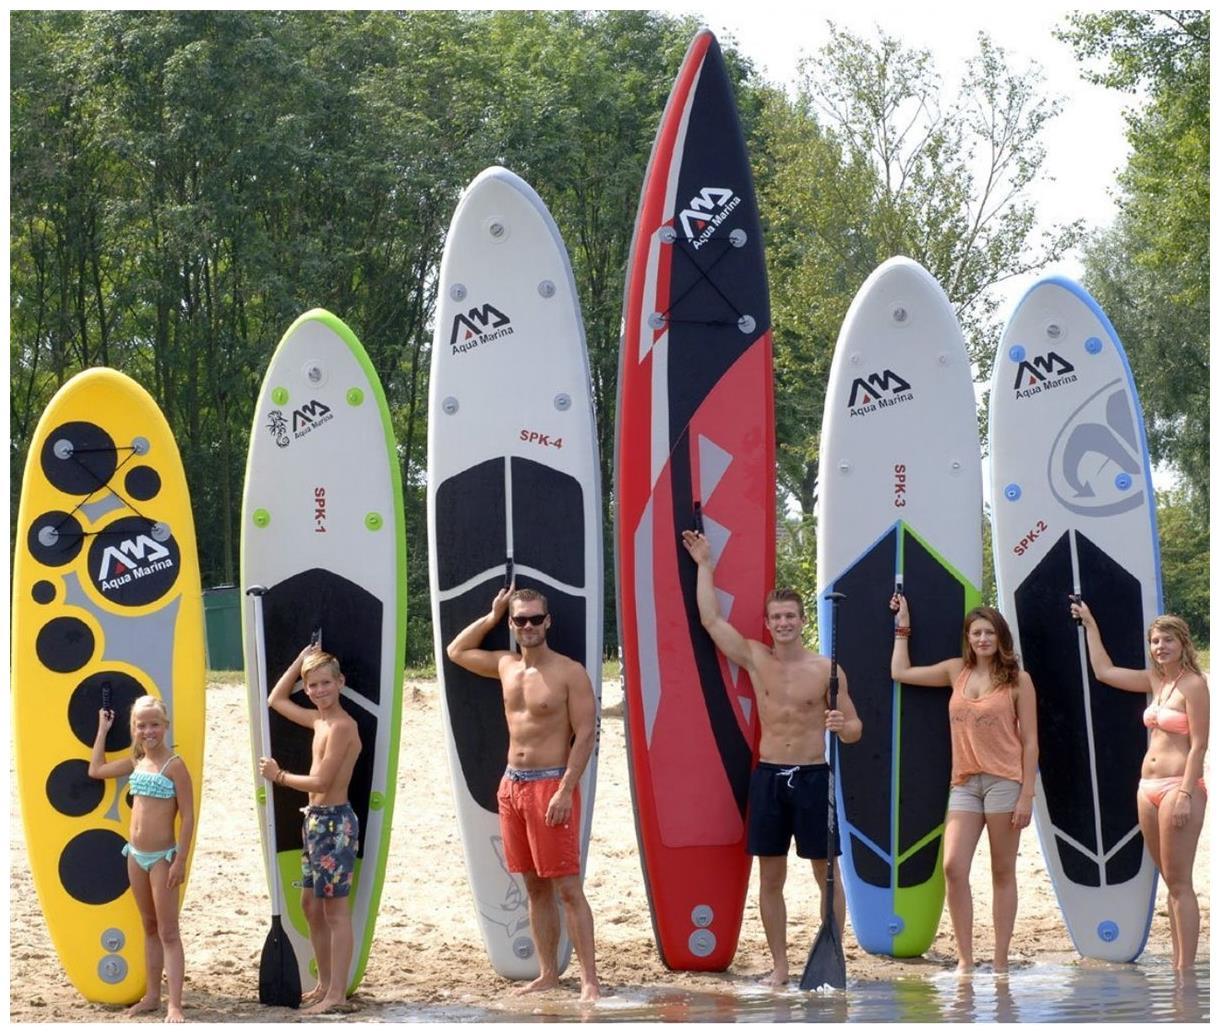 aqua marina sup stand up paddle board aufblasbar pumpe paddel surfboard inflatab ebay. Black Bedroom Furniture Sets. Home Design Ideas